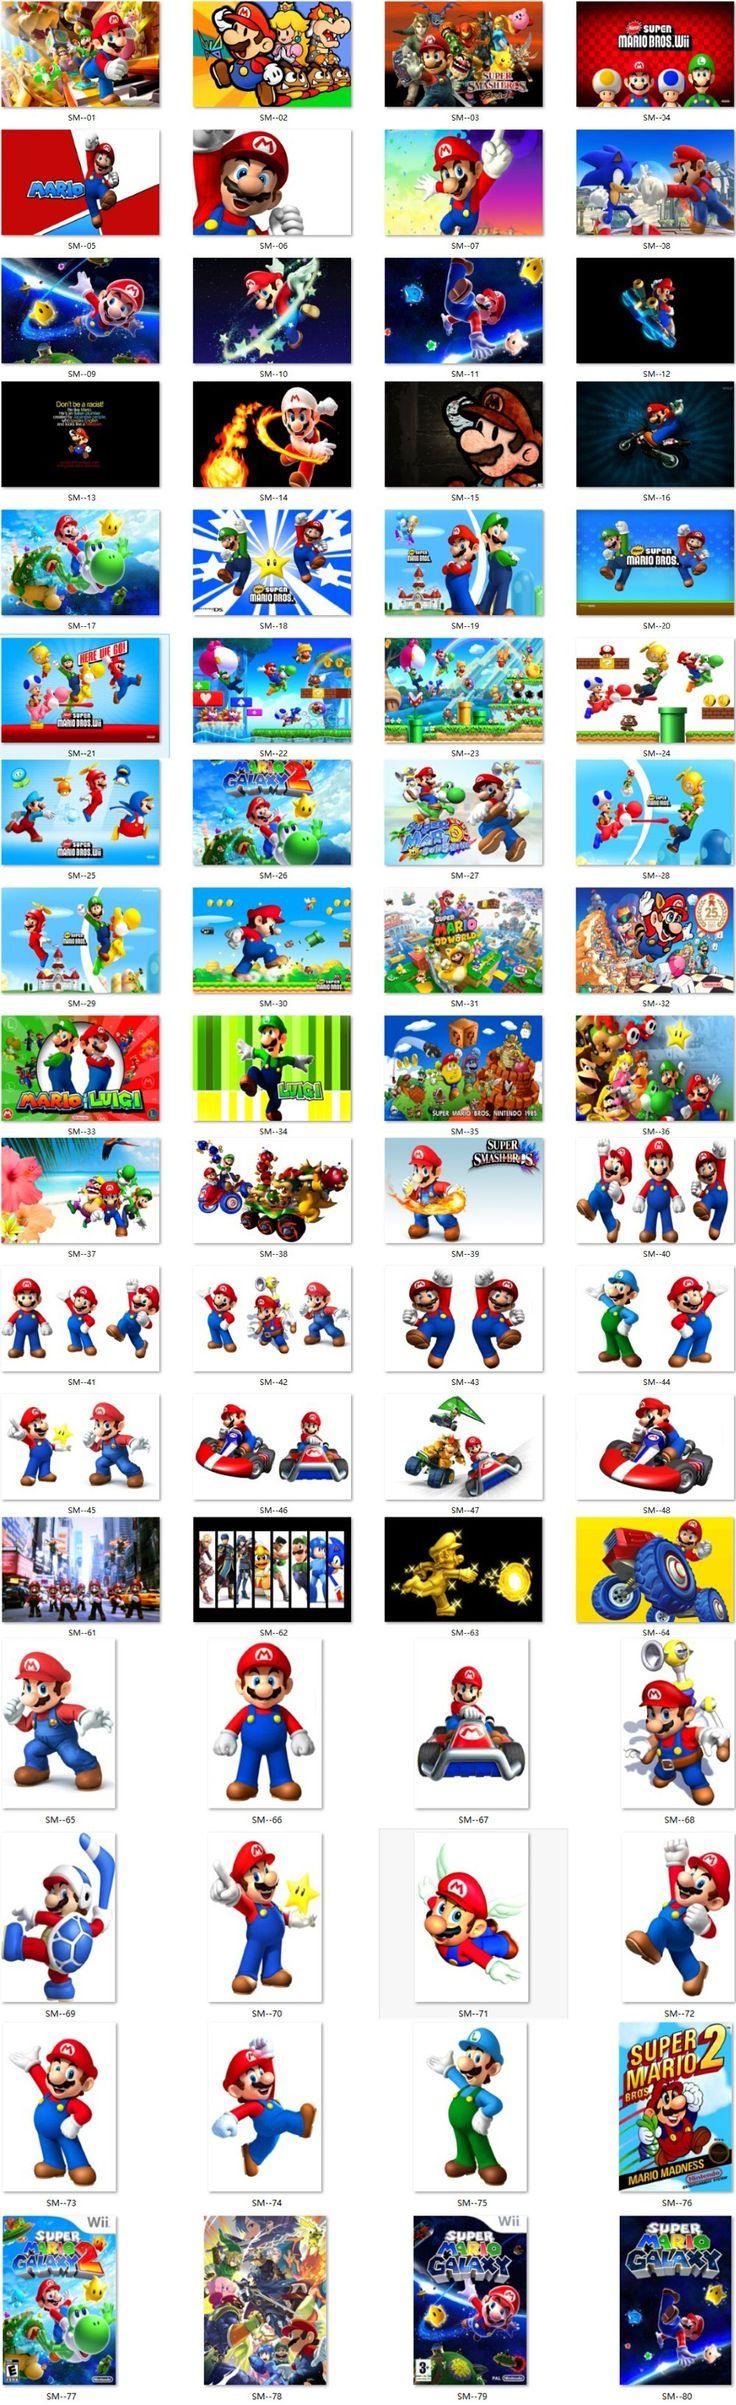 Custom Canvas Art Super Mario Wall Stickers Super Mario Bros Figures Posters Video Games Wallpaper Christmas Decoration #498#